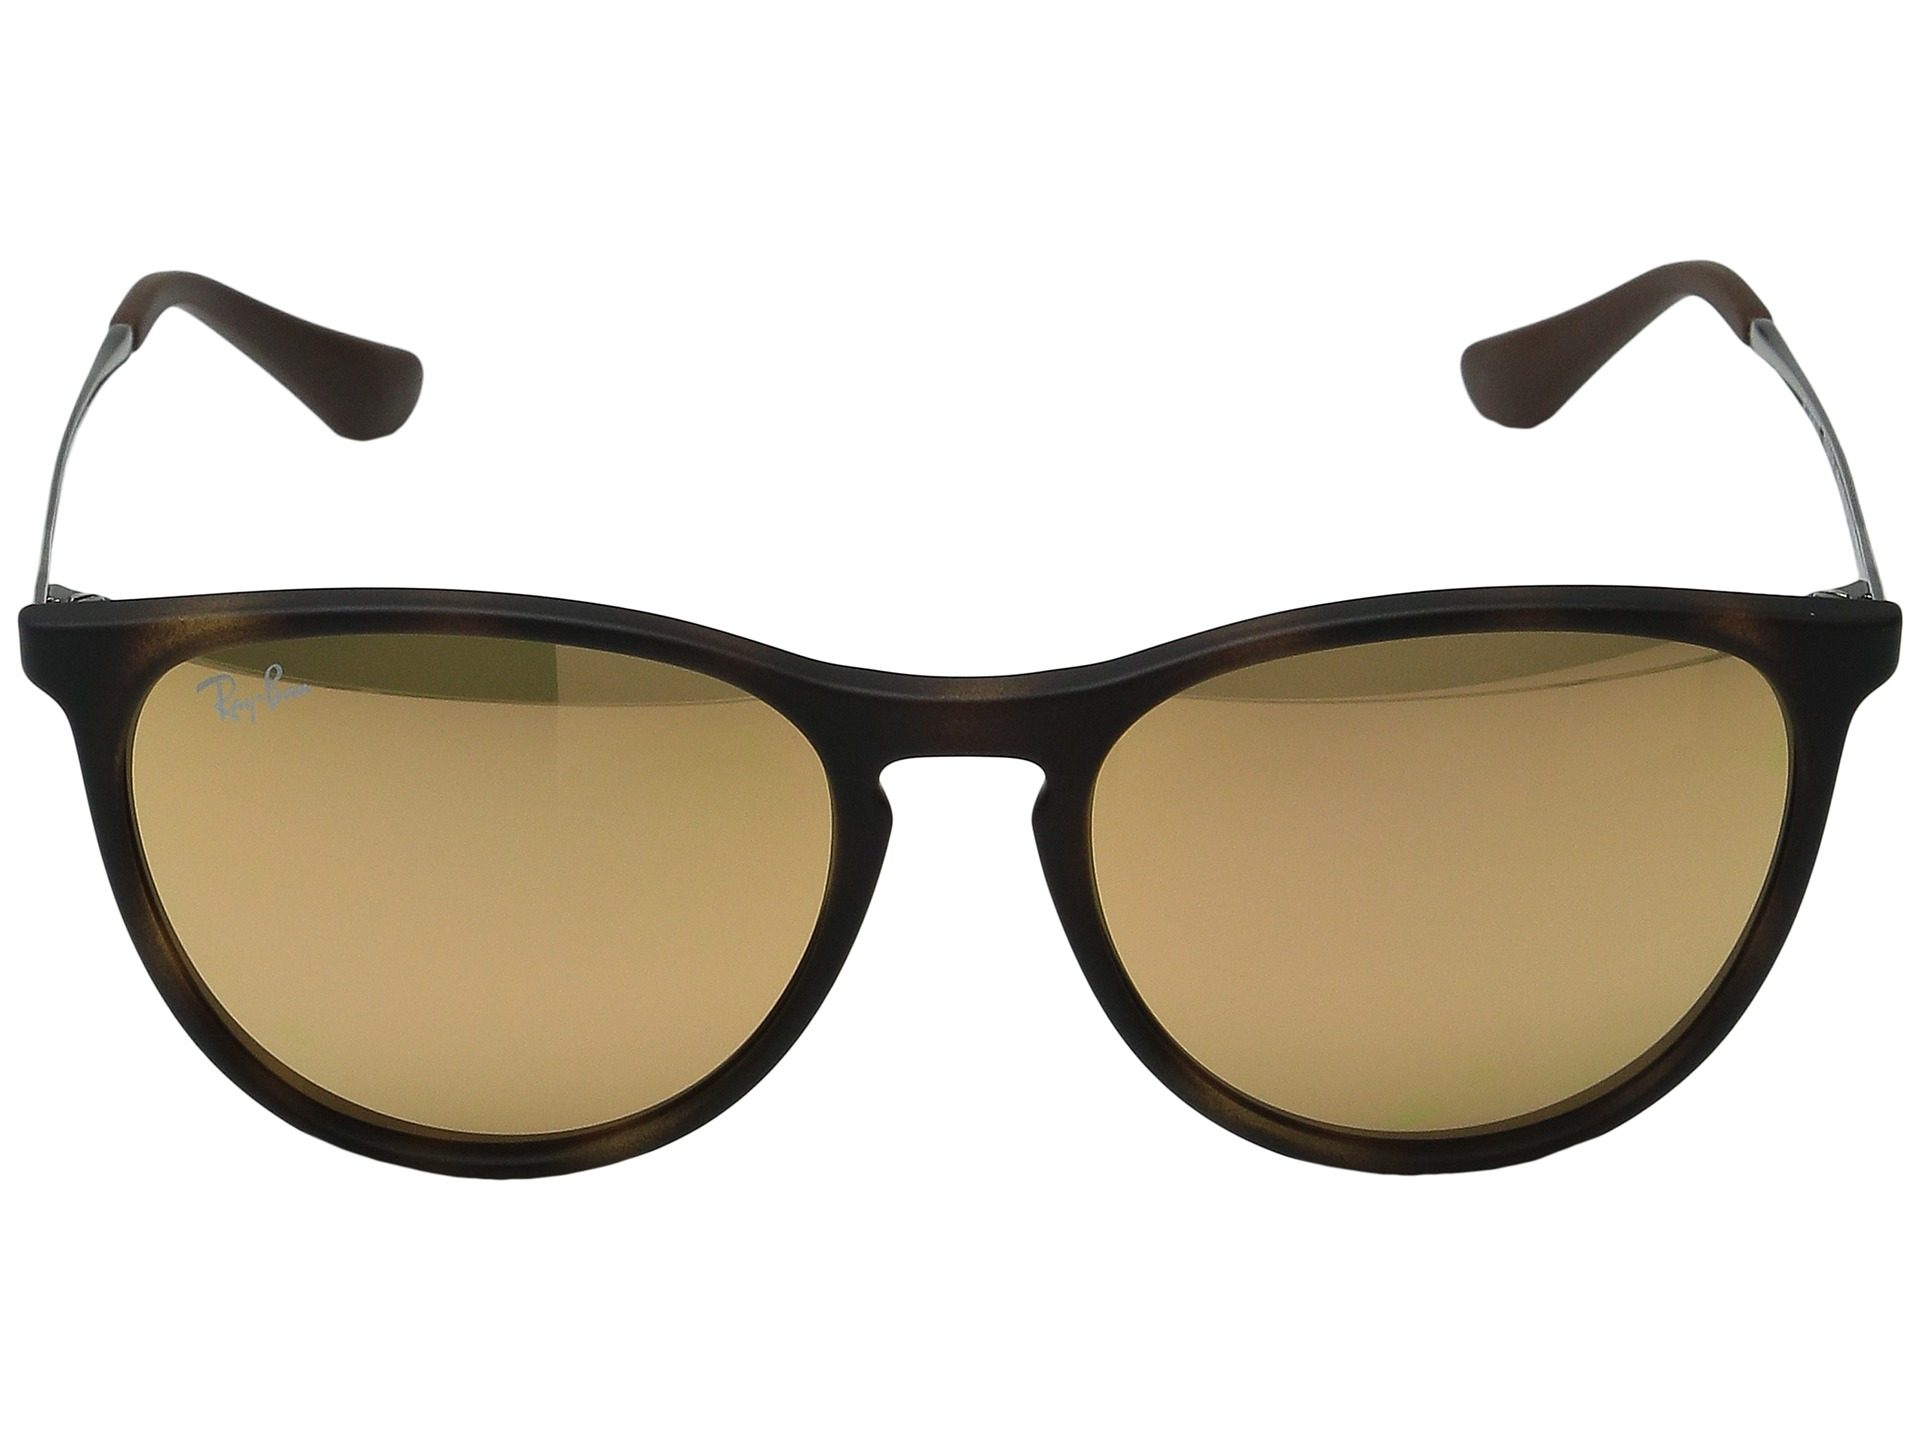 Black And Pink Ray Ban Sunglasses Zappos | Louisiana Bucket Brigade